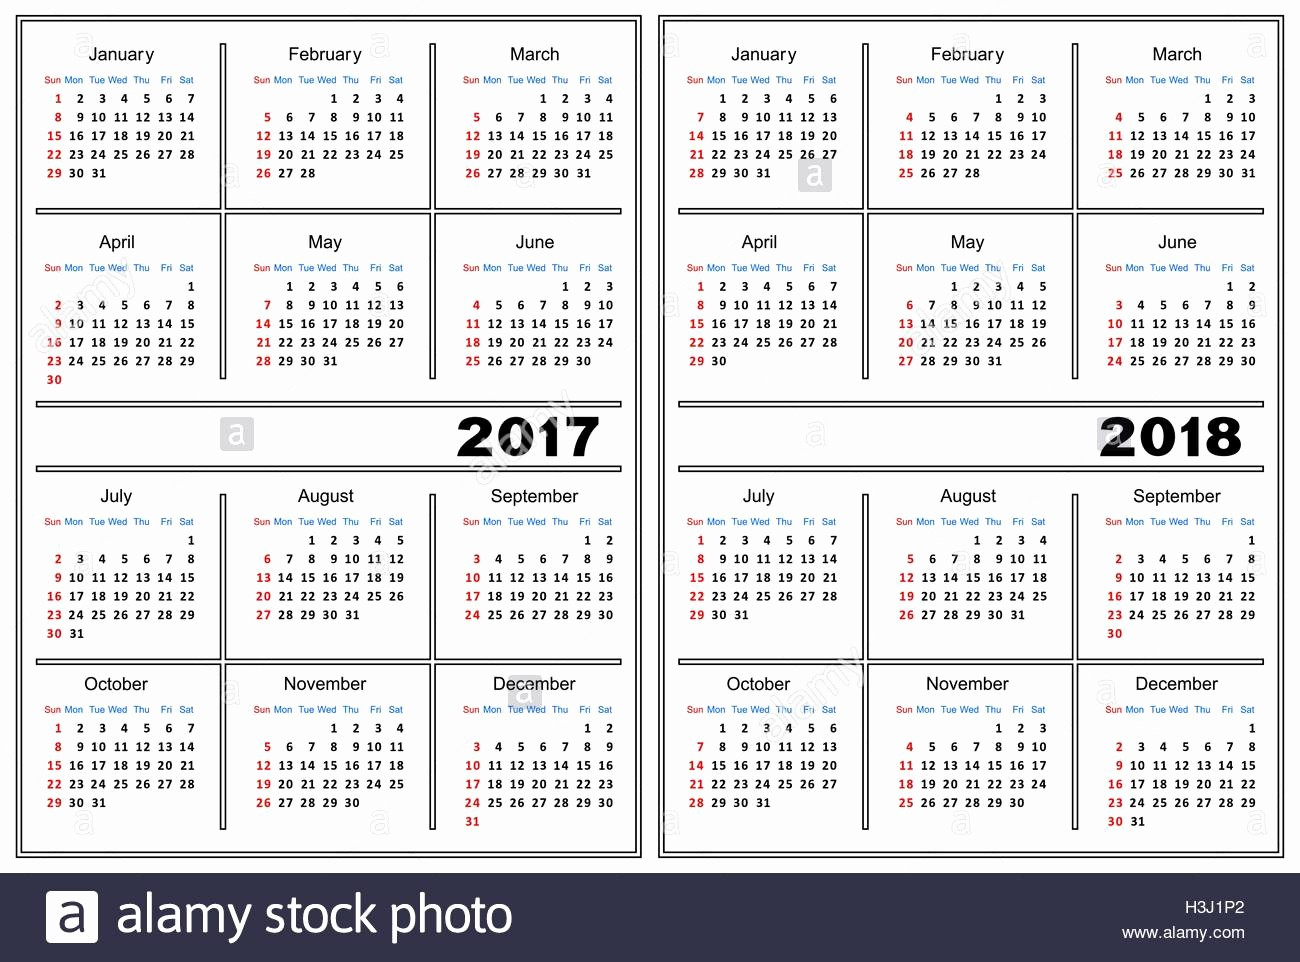 2017-2018 Blank Calendar Beautiful Calendar Template 2017 2018 Stock Vector Art